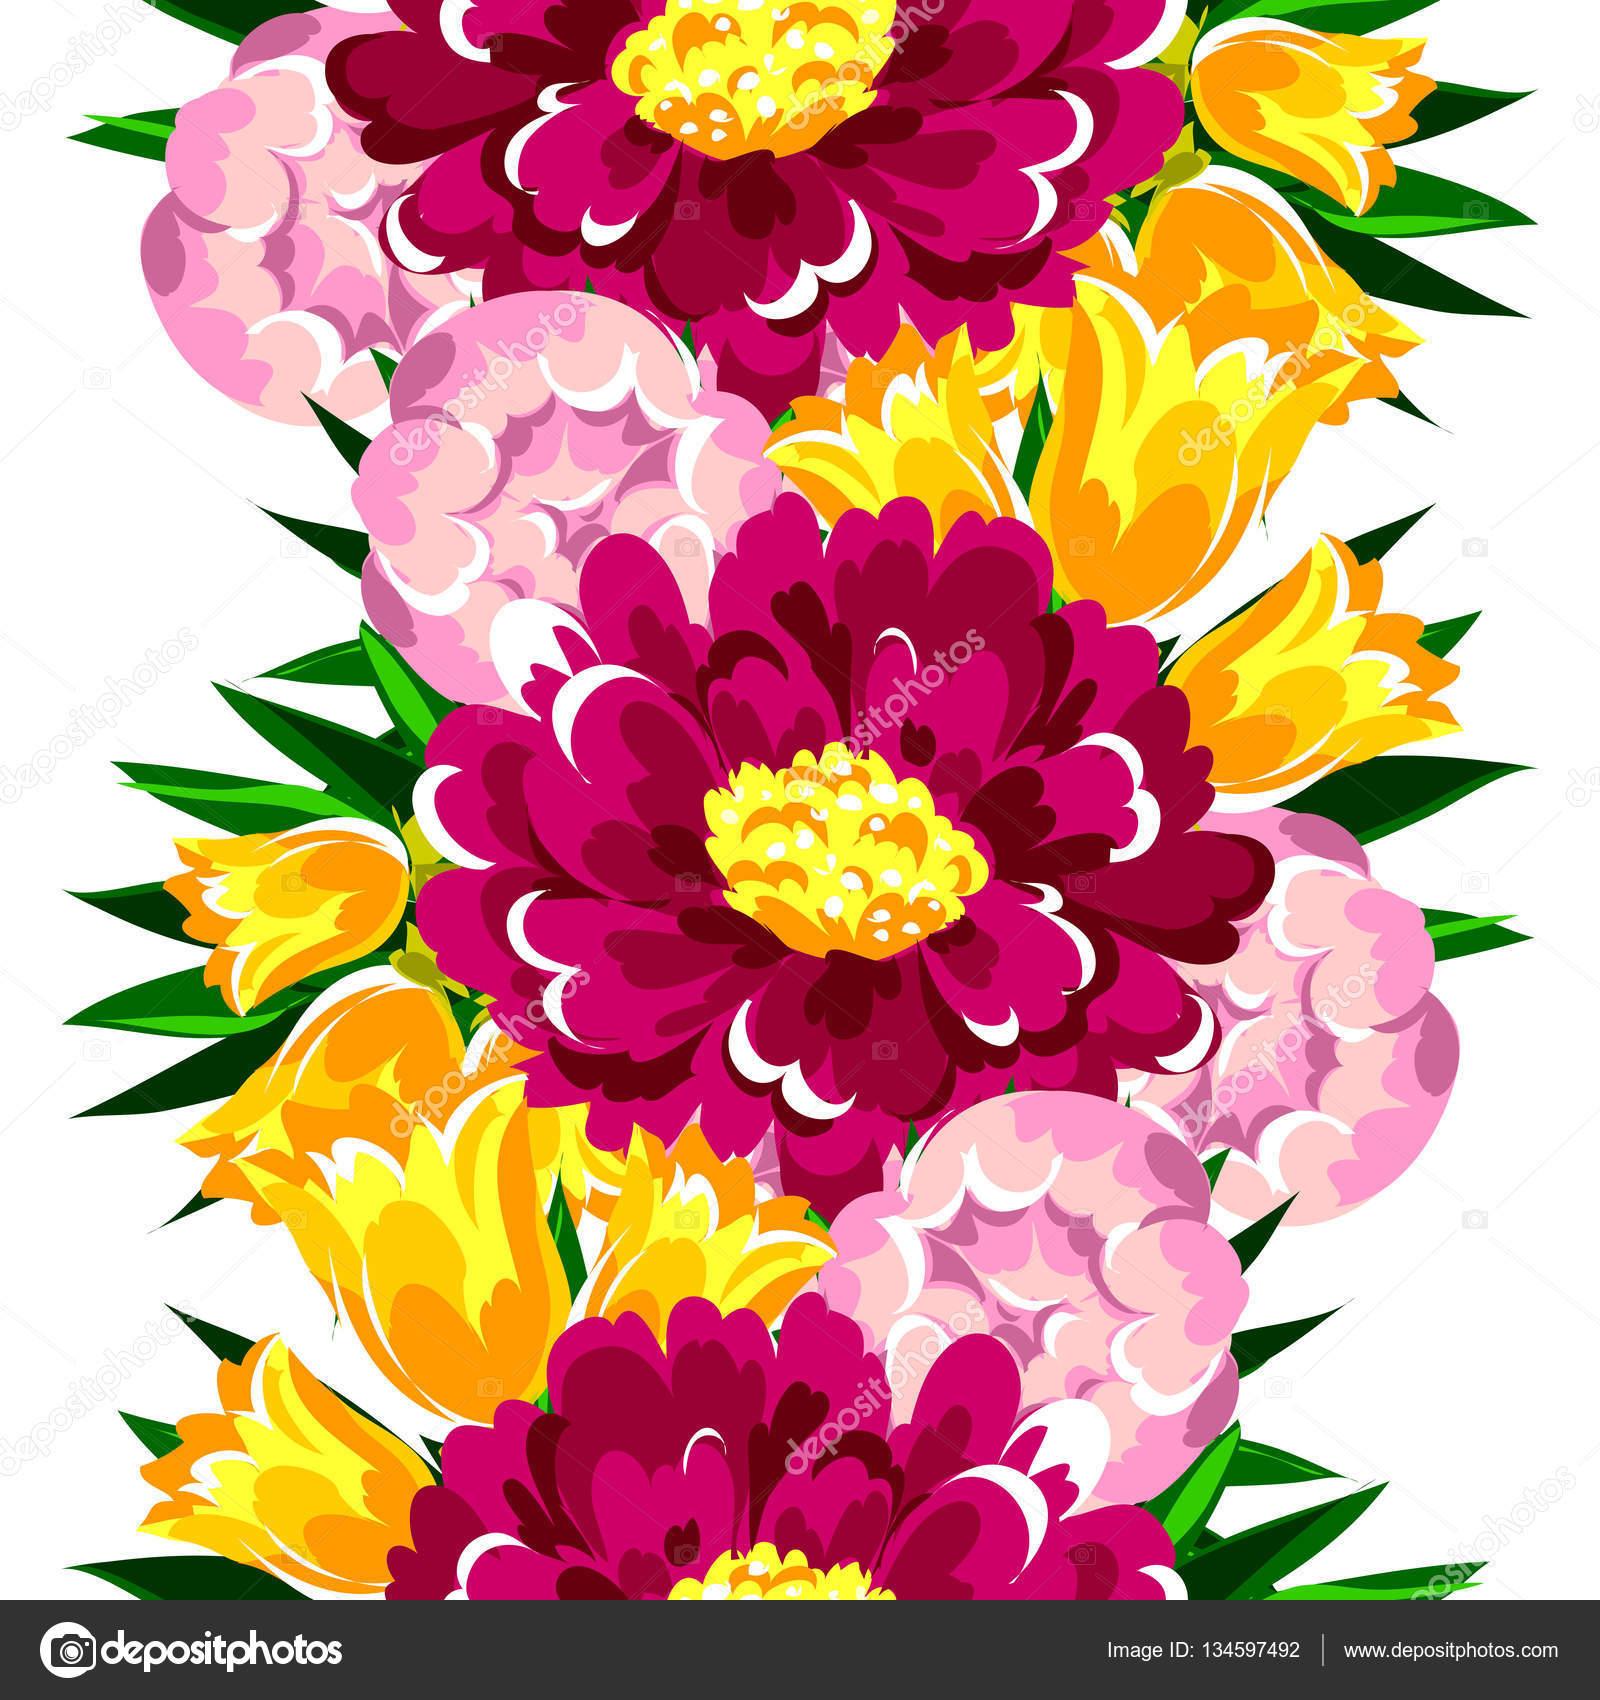 Beautiful flowers ornament stock vector all about flowers 134597492 beautiful flowers ornament stock vector izmirmasajfo